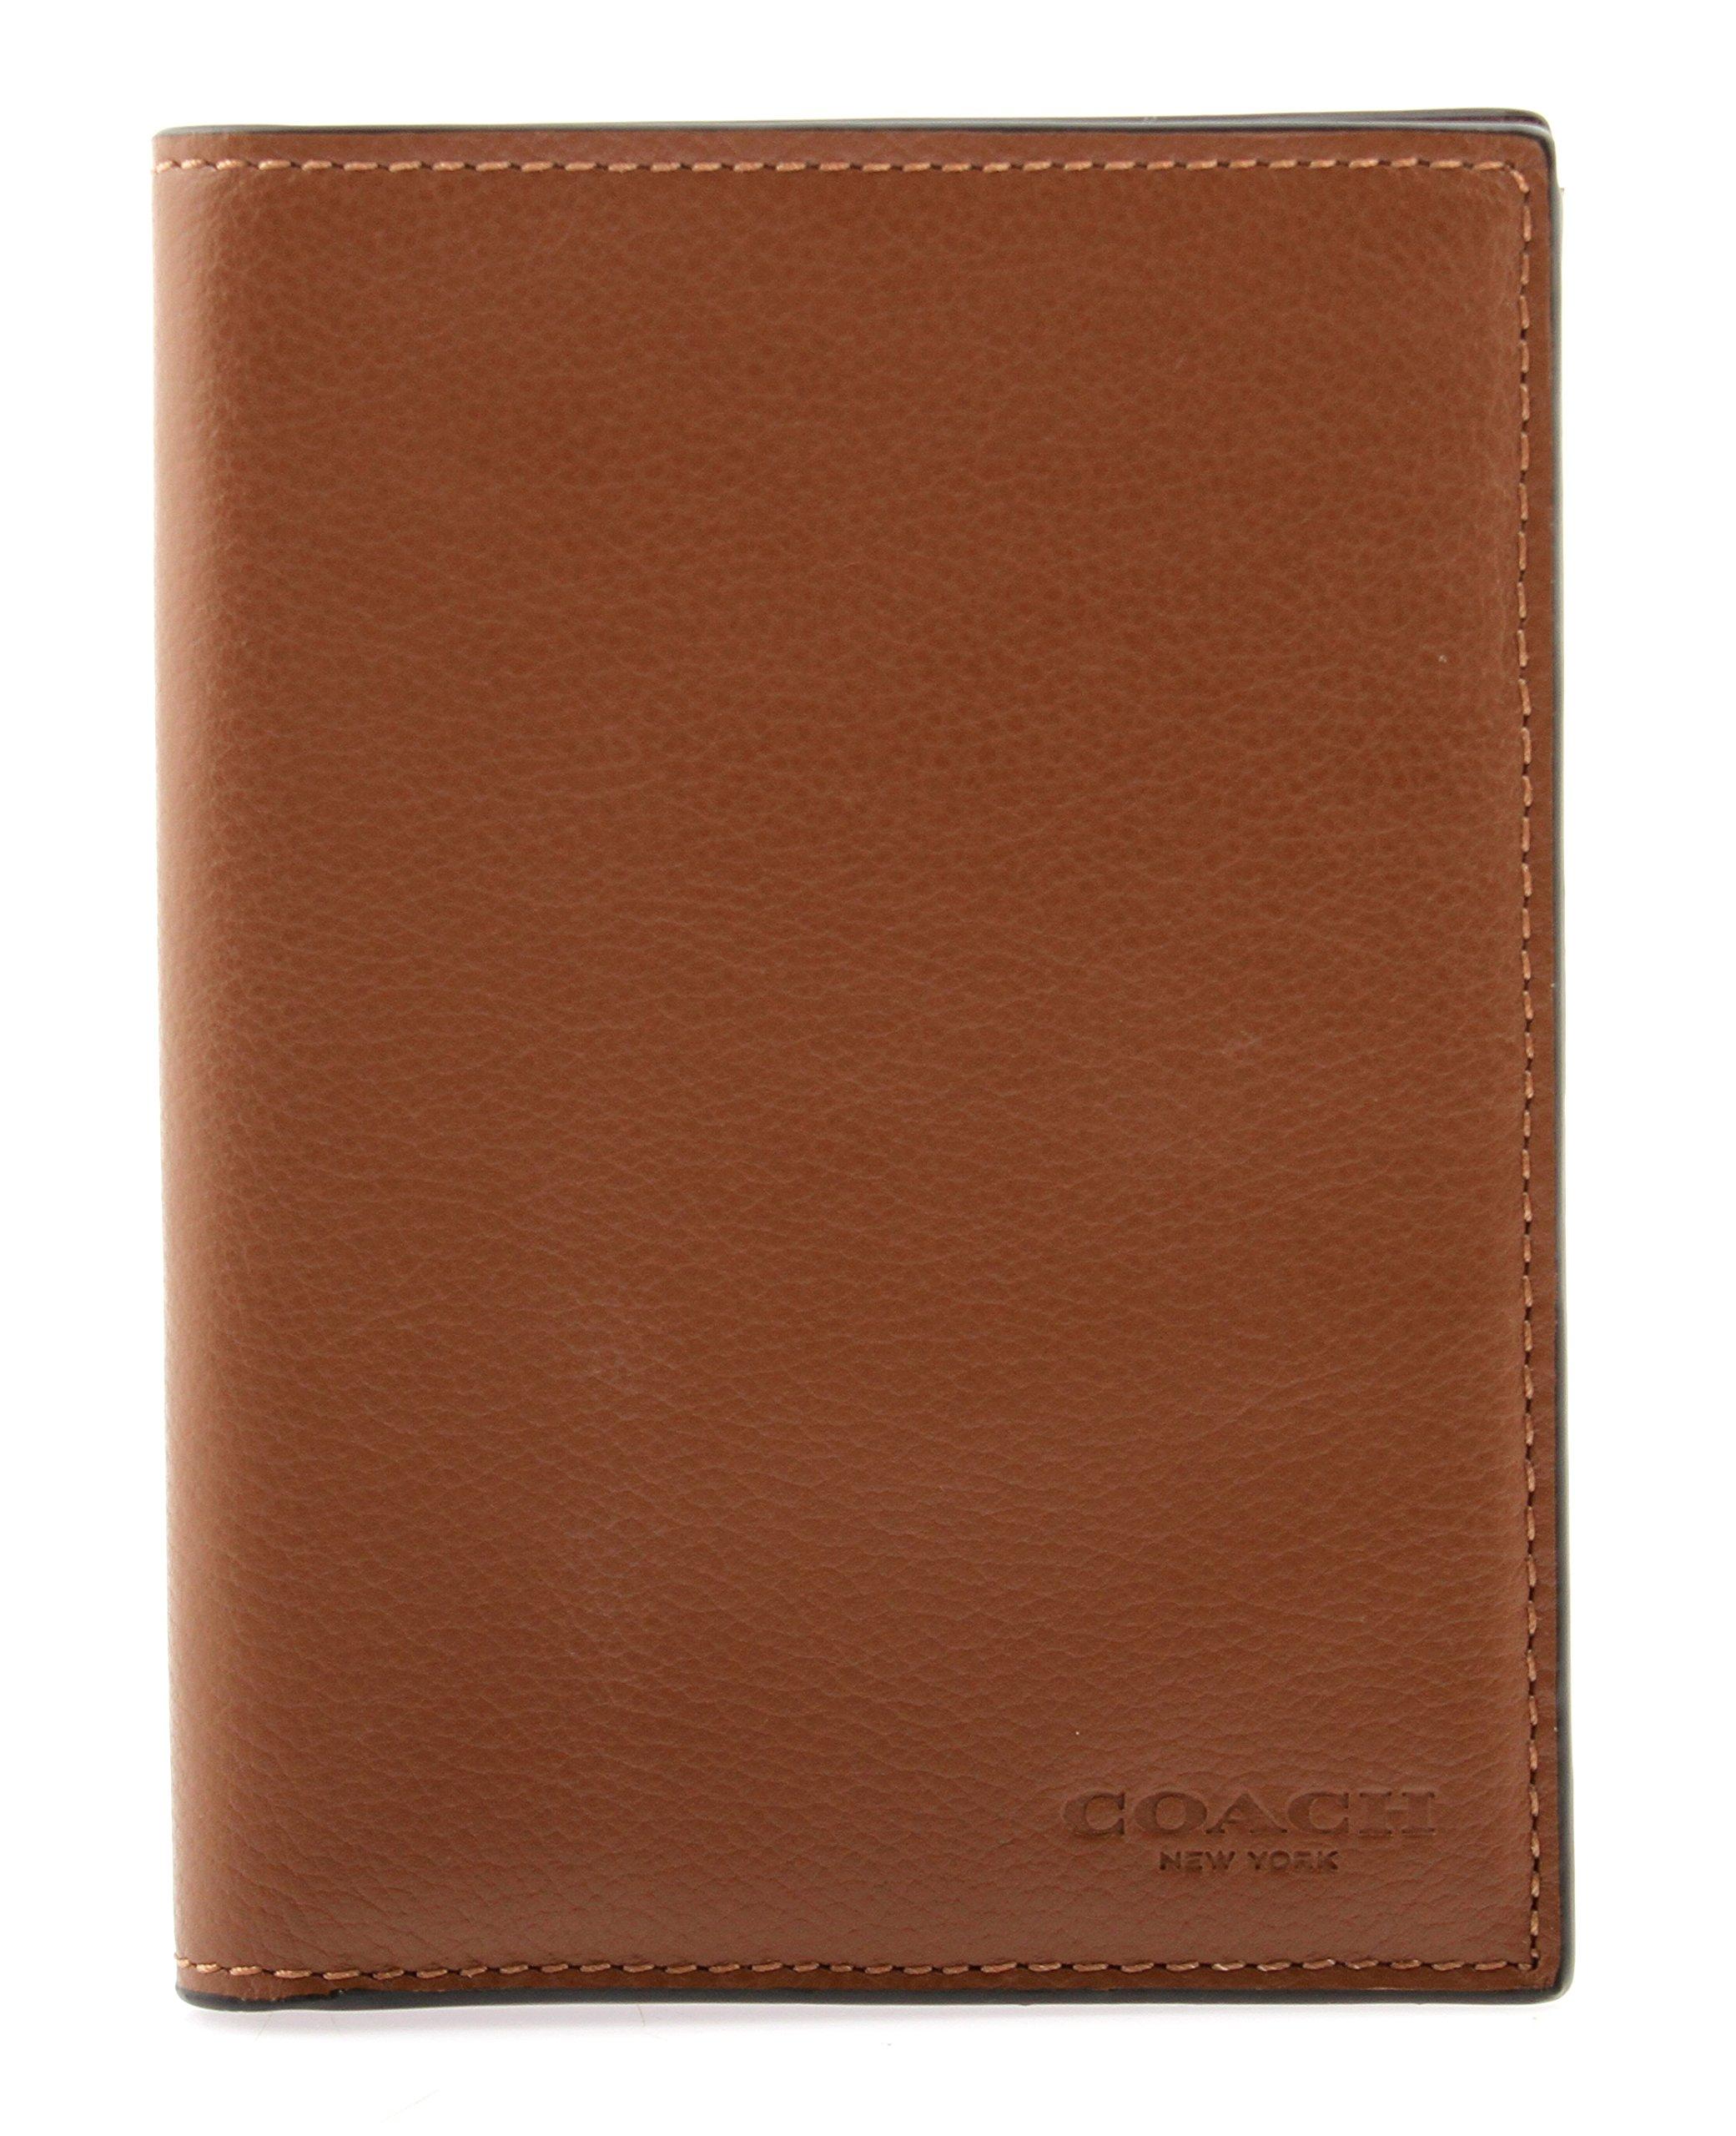 Coach Calf Leather Passport Case in Dark Saddle, F93604 CWH